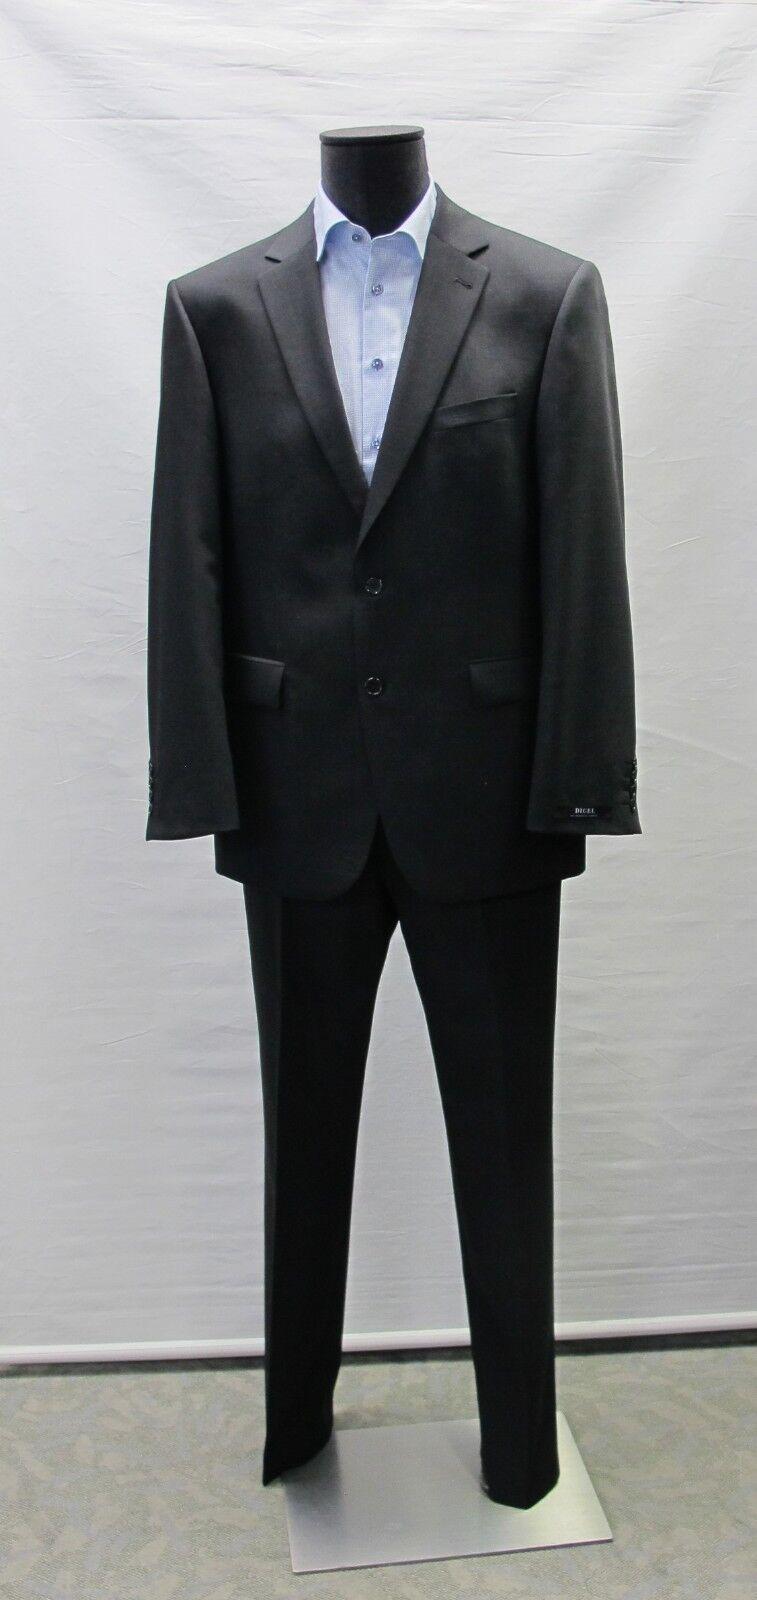 DIGEL Anzug protect 3, Art.: 99802, Farbe Anthrazit,